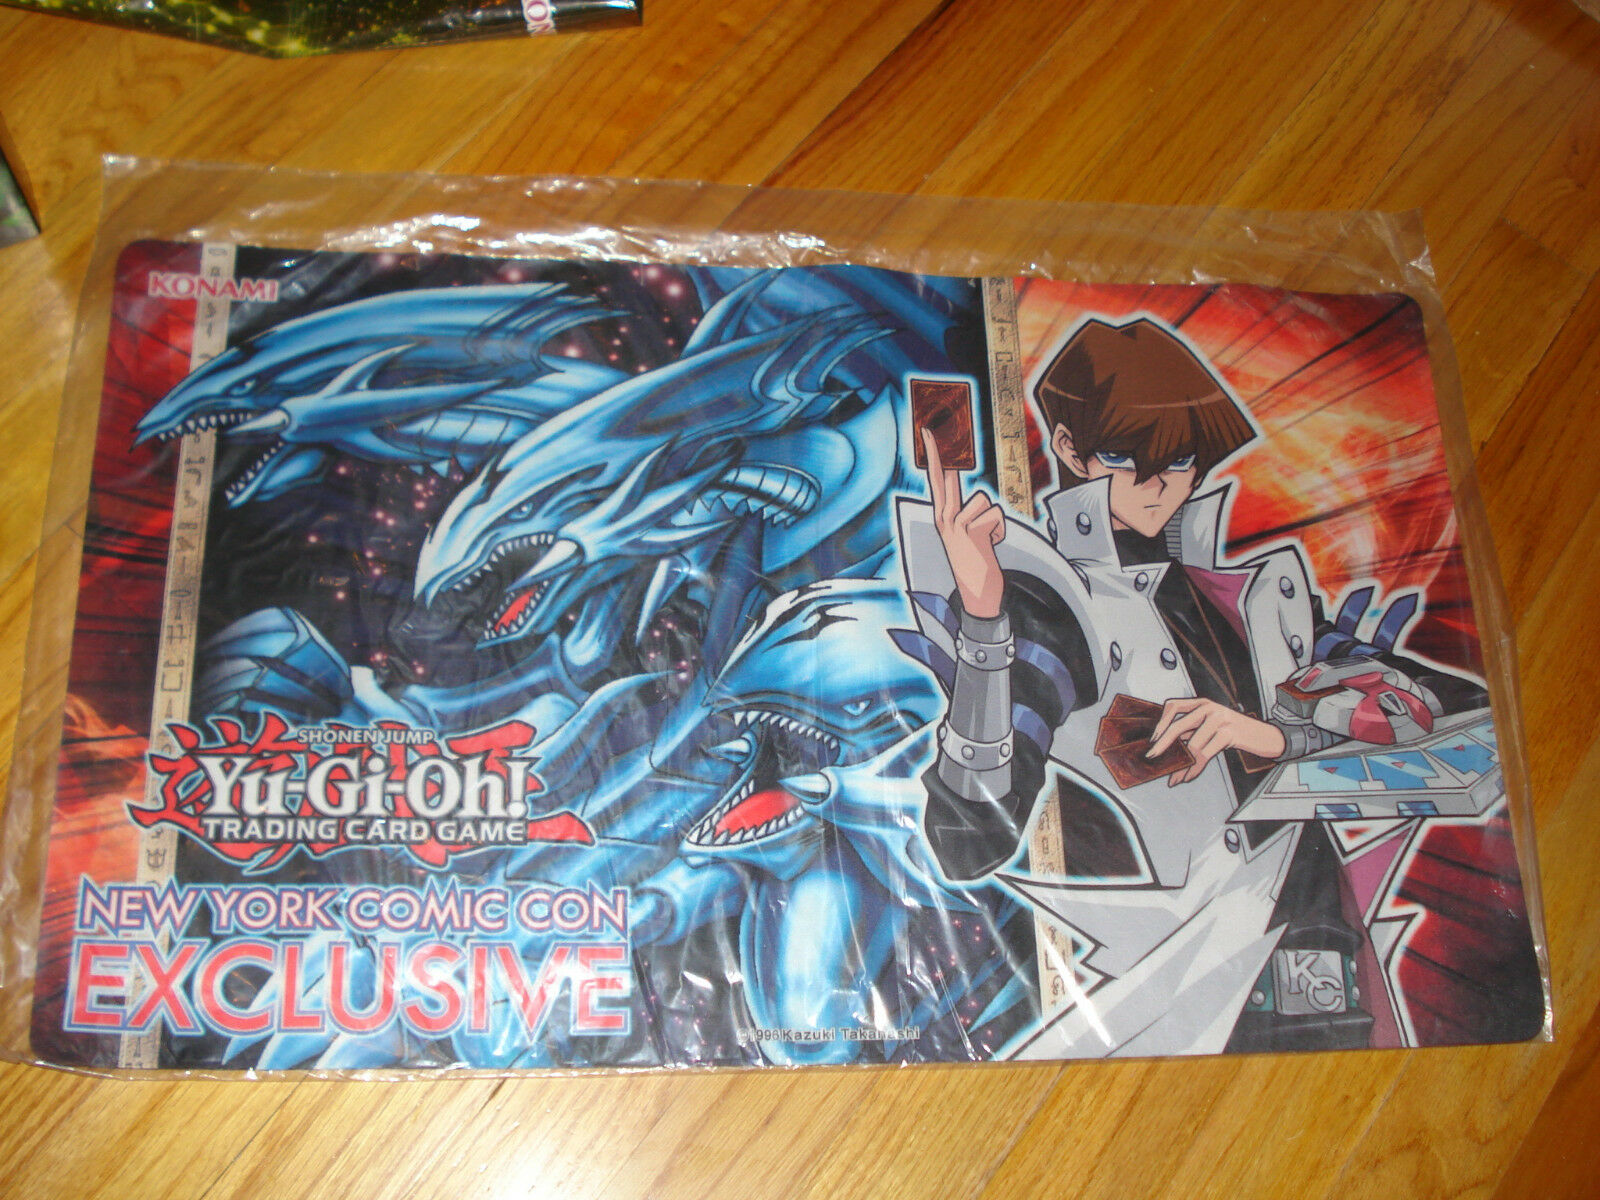 Yu-Gi-Oh bluee Eyes Ultimate Dragon Kaiba NYCC NYCC NYCC 2015 comic con exclusive playmat 707d77